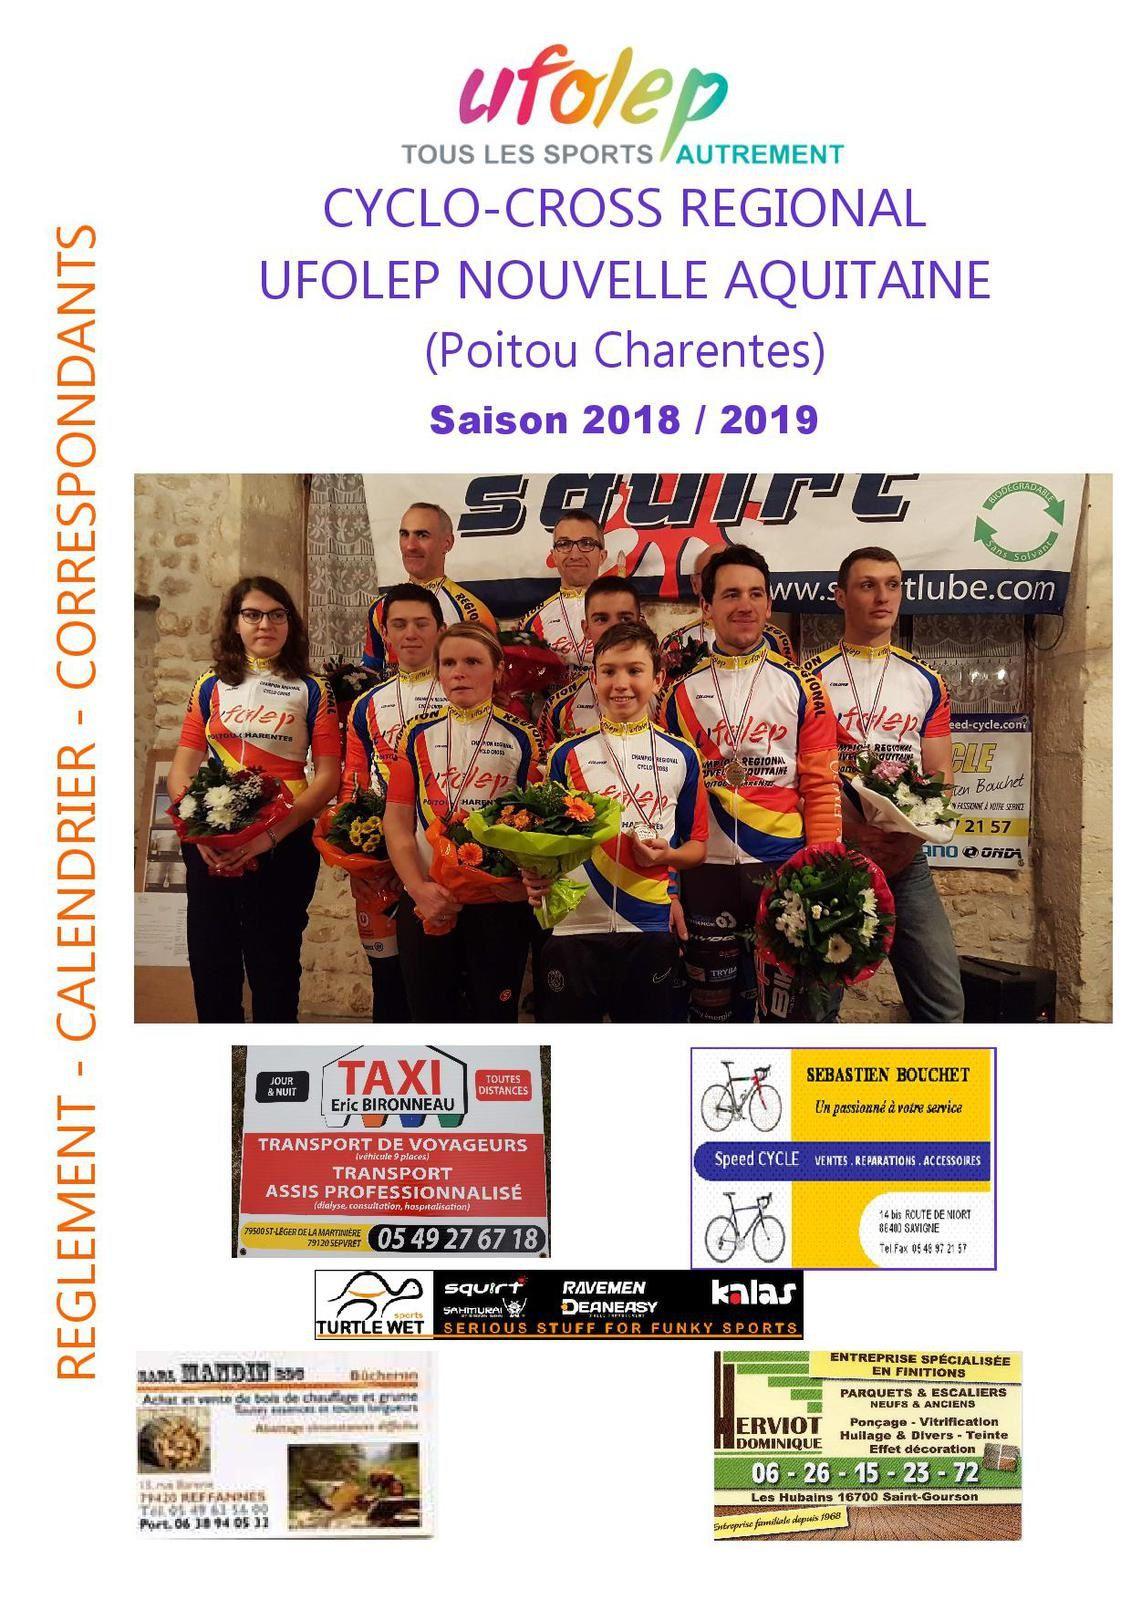 CALENDRIER 2018/2019 CYCLO-CROSS REGIONAL UFOLEP NOUVELLE AQUITAINE